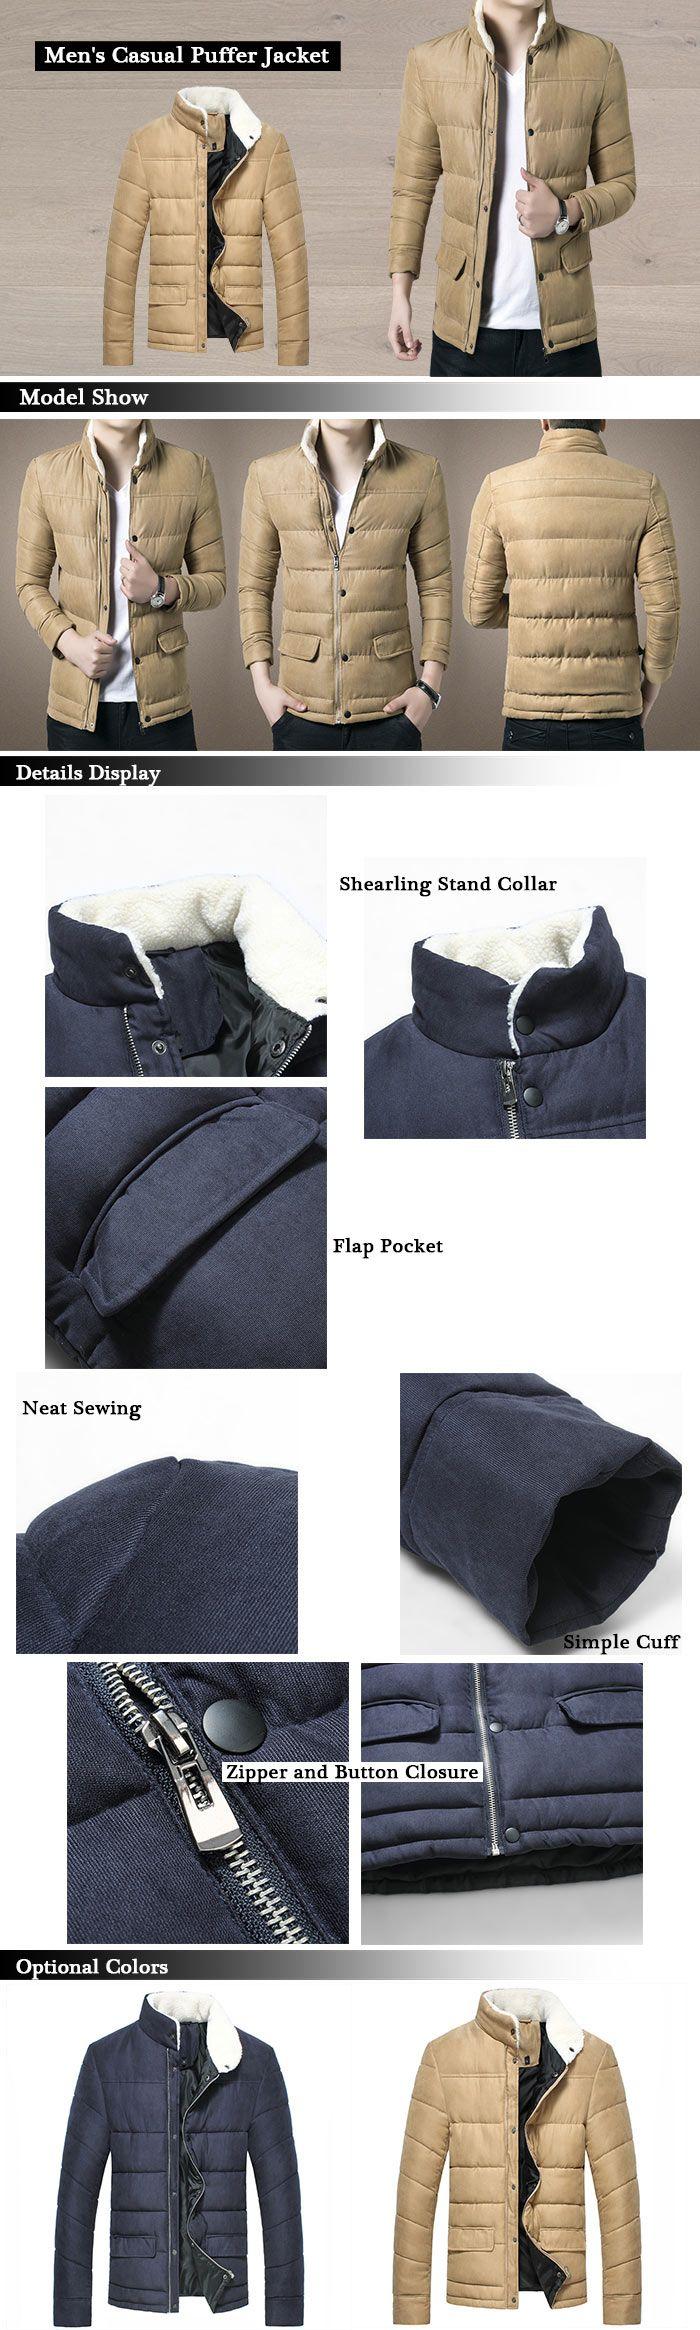 Stand Collar Zip Up Puffer Jacket